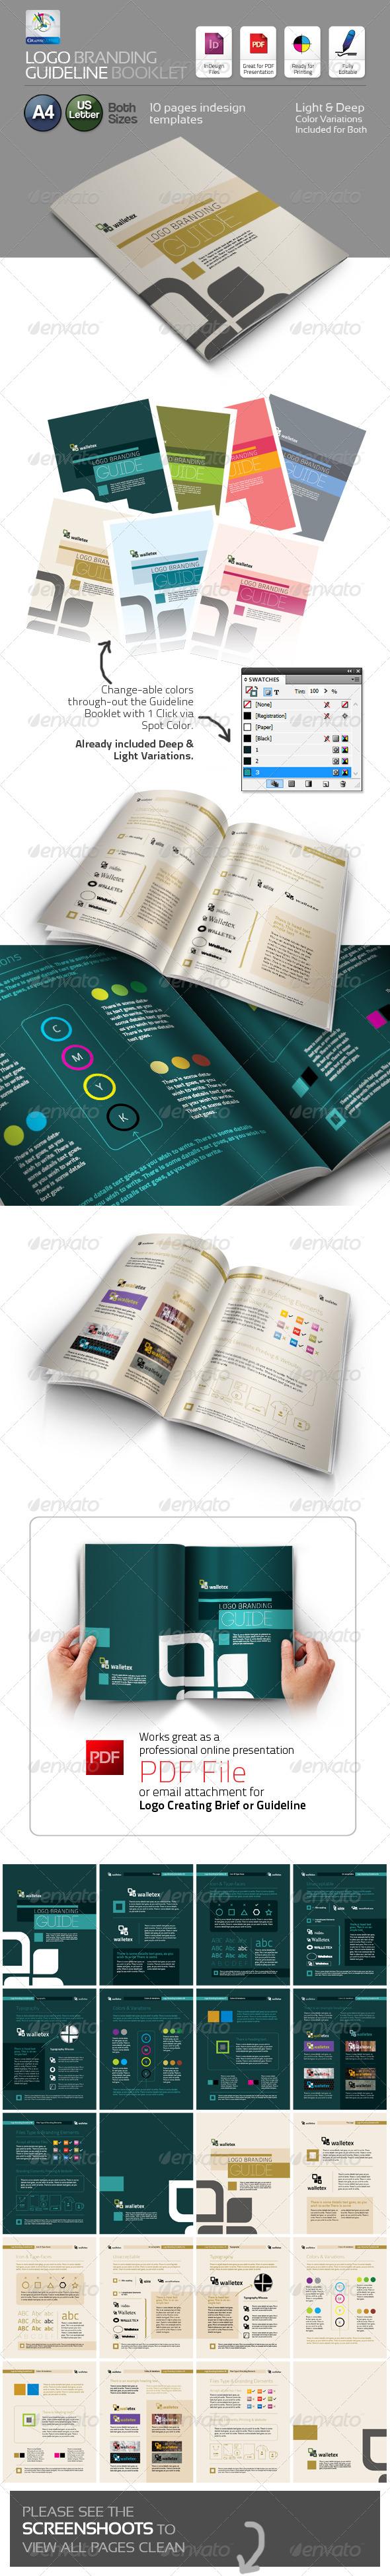 GraphicRiver Logo Branding Guideline Booklet 4463466